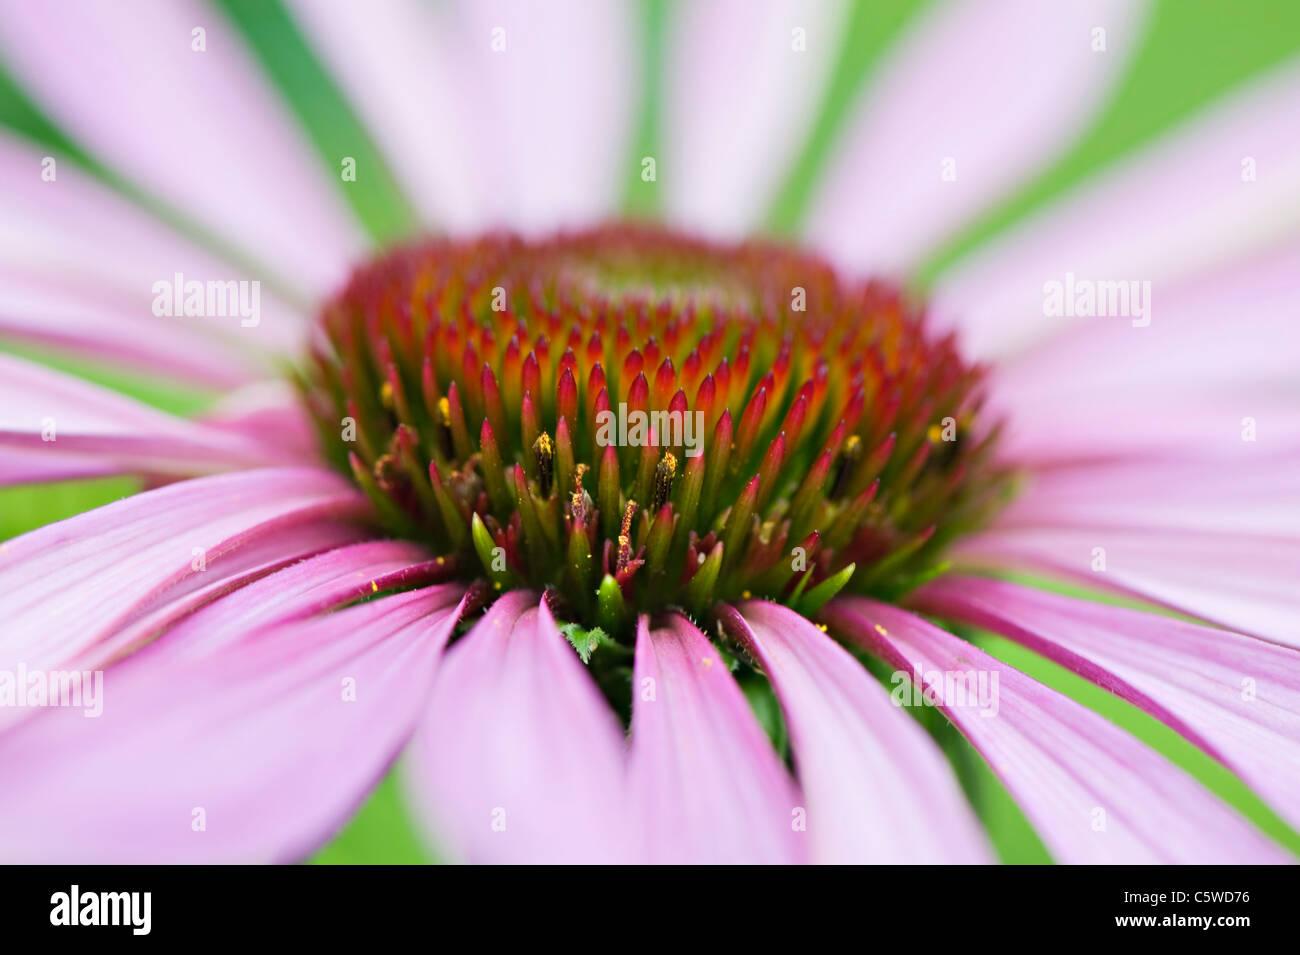 Close-up image of the summer flowering Eastern Purple Coneflower - Echinacea purpurea pink flowers, image taken - Stock Image